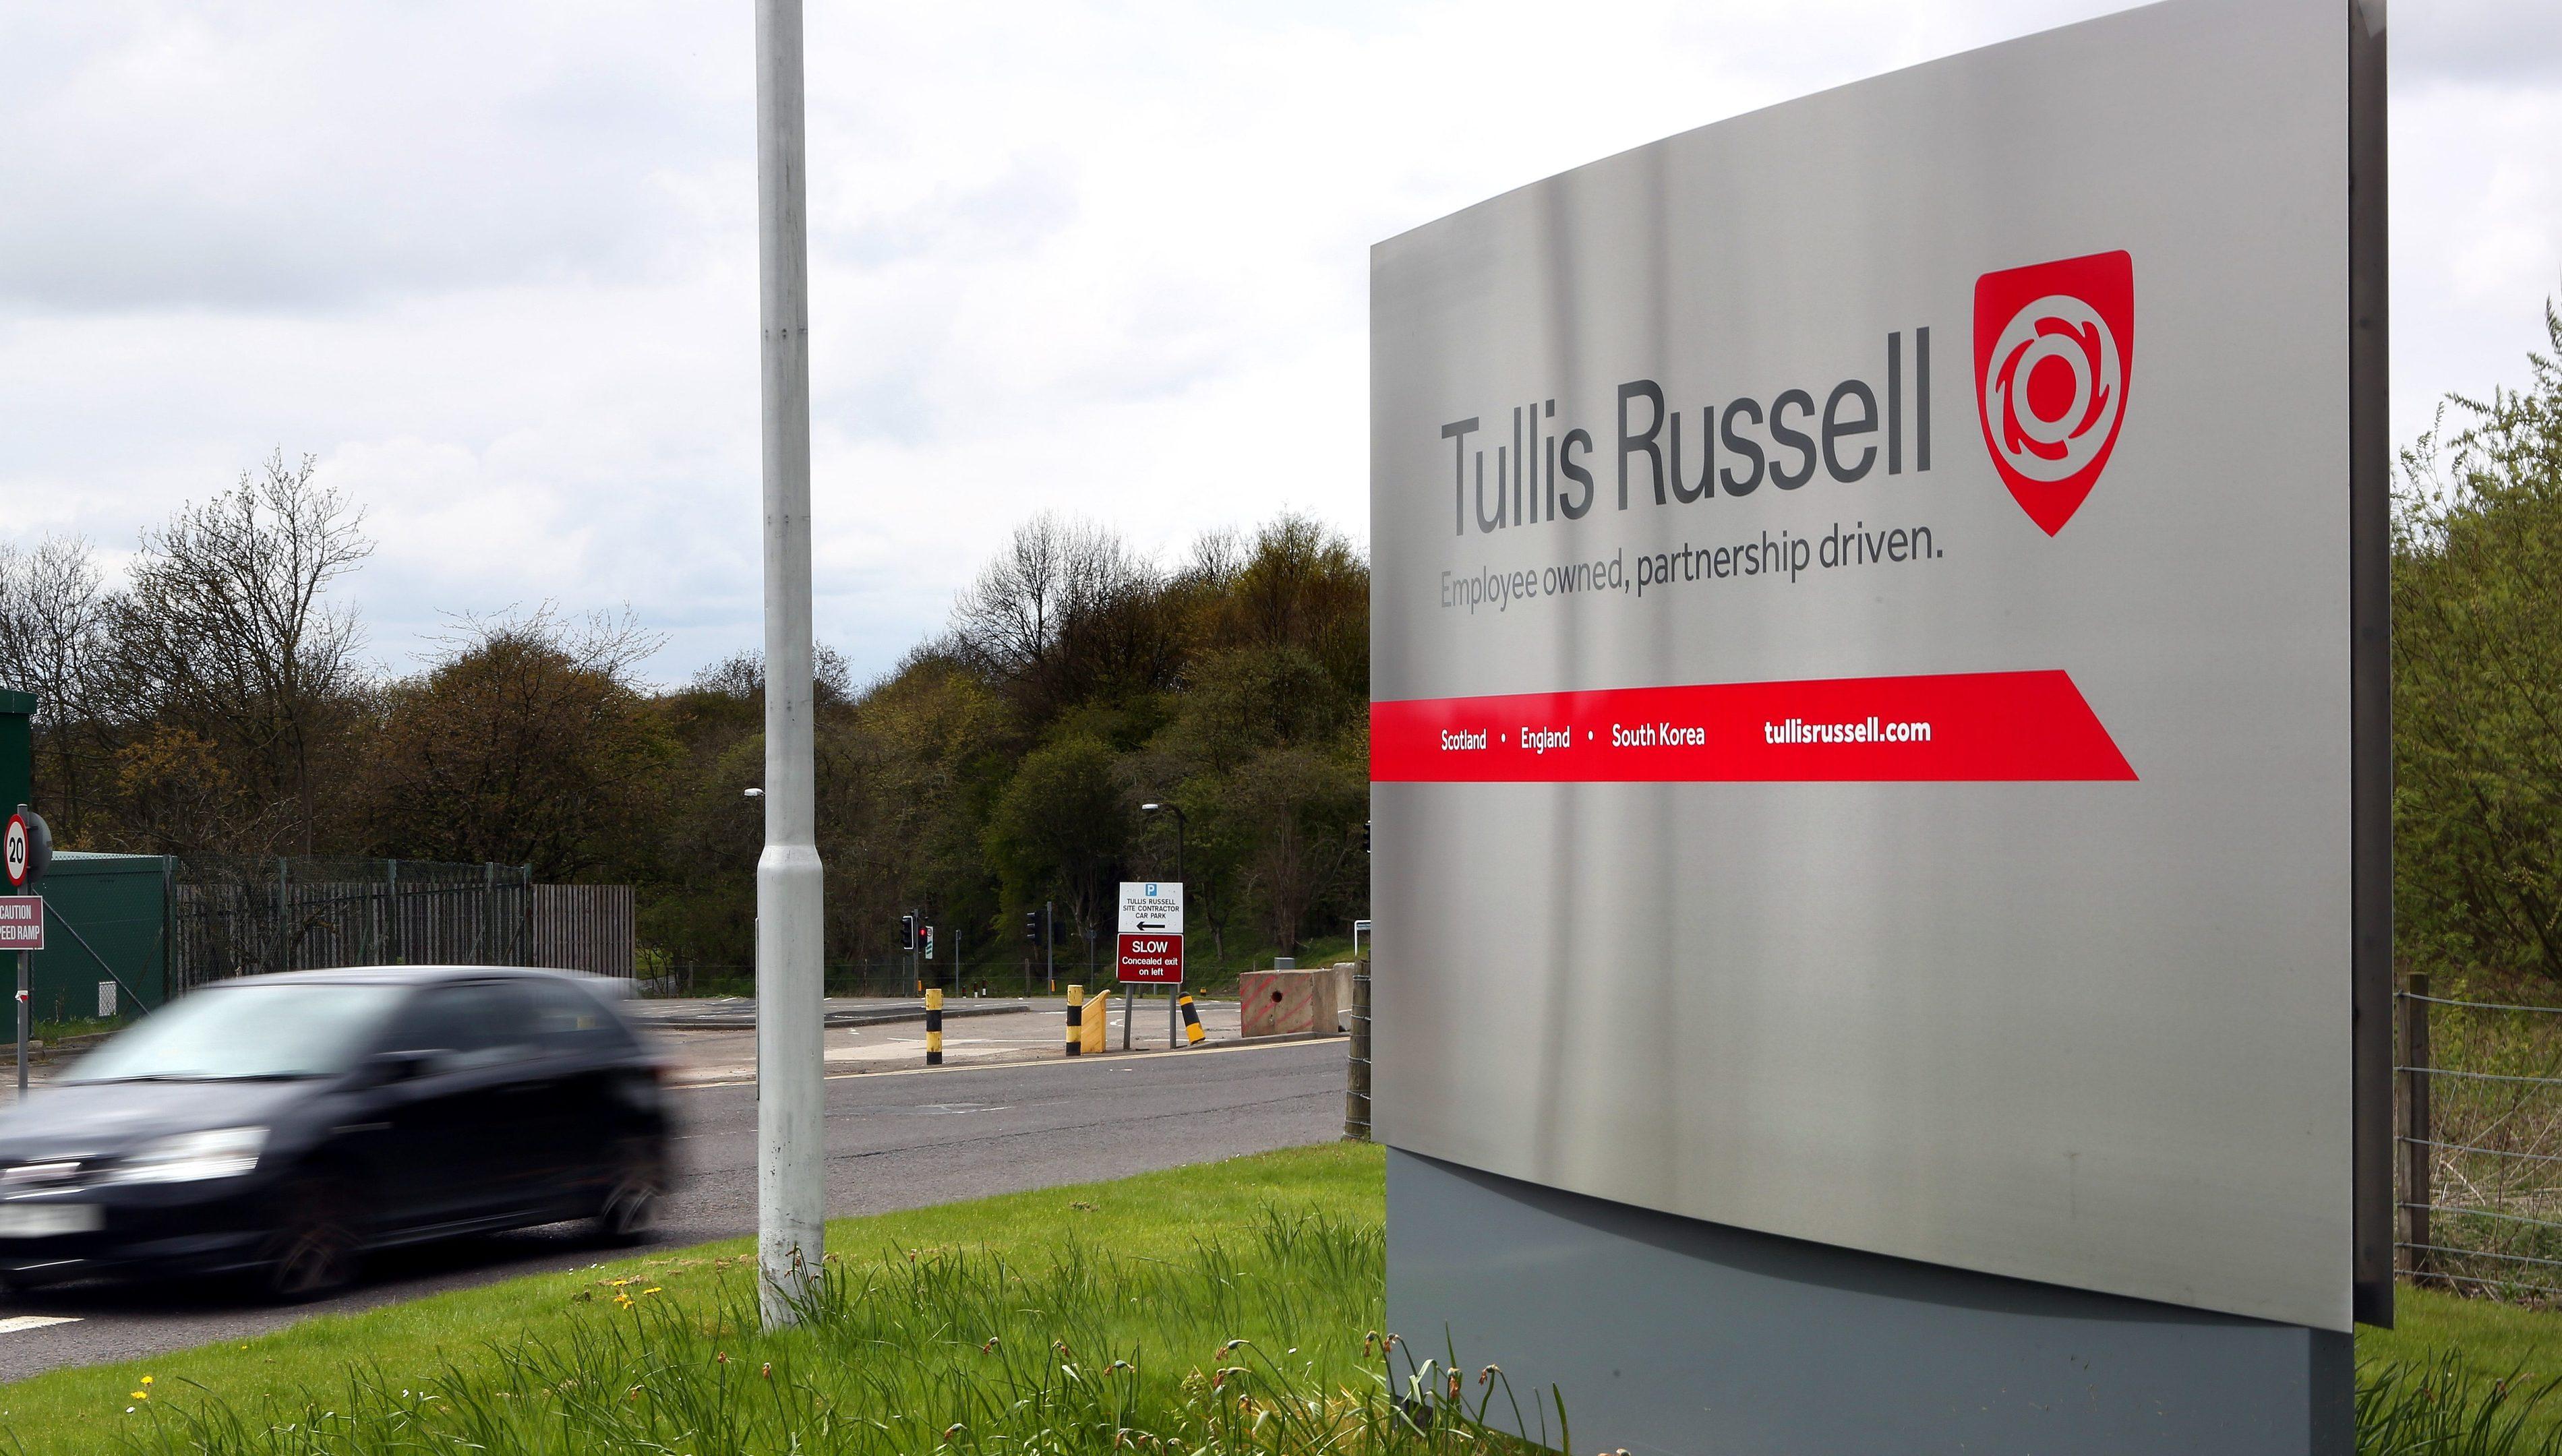 The Tullis Russell site near Markinch.